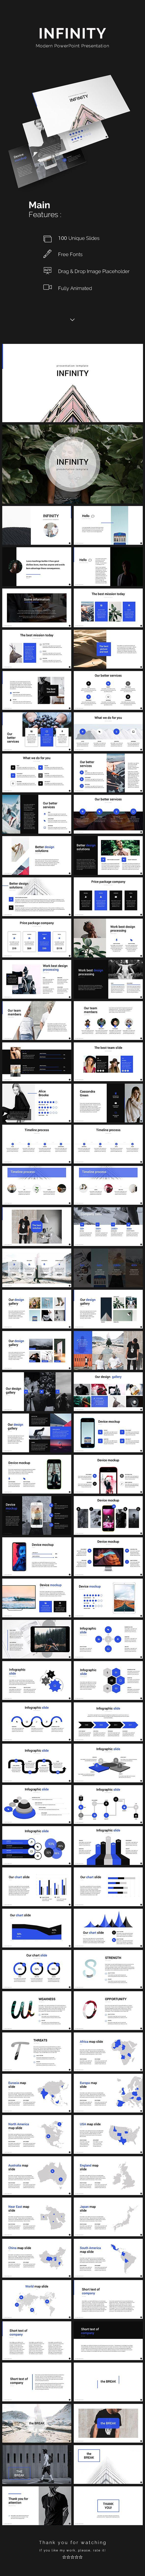 Infinity #PowerPont Template - PowerPoint Templates Presentation #Templates